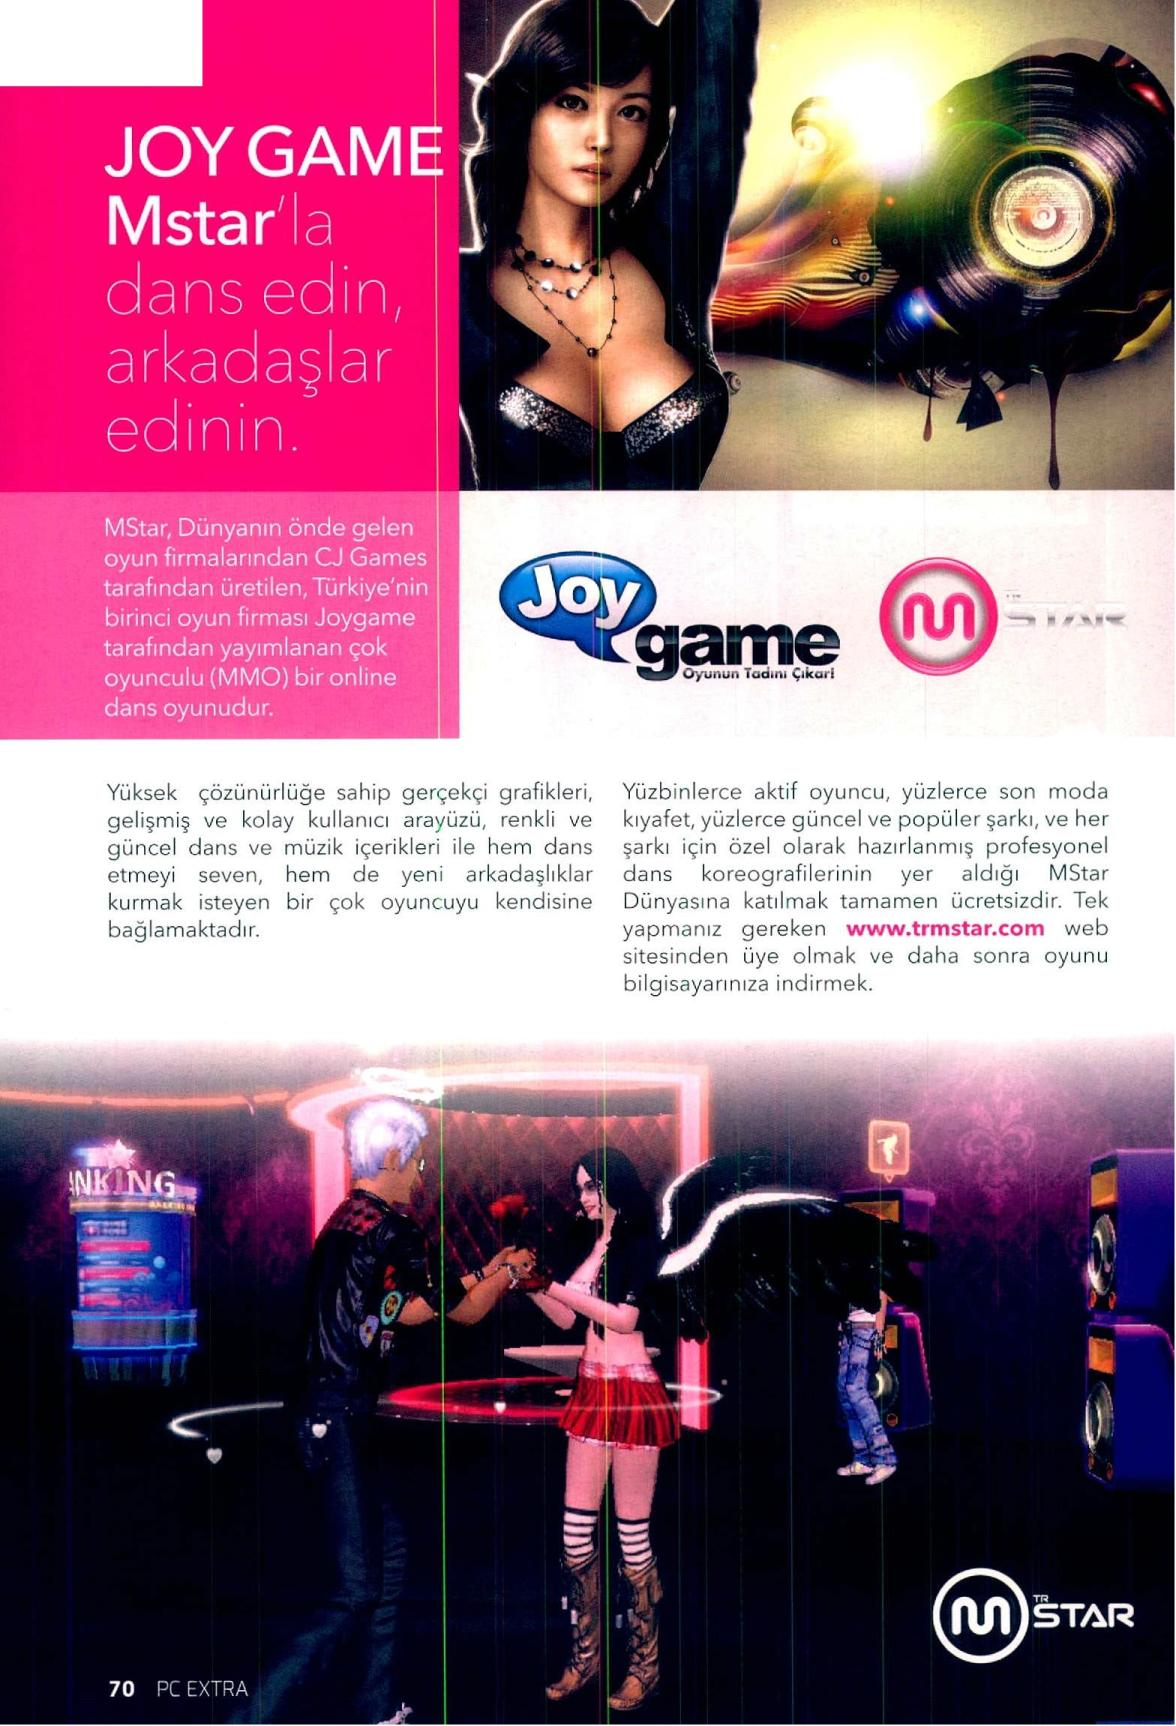 Netmarble-Turkey-PC-Extra-Sayfa-70-01.12.14